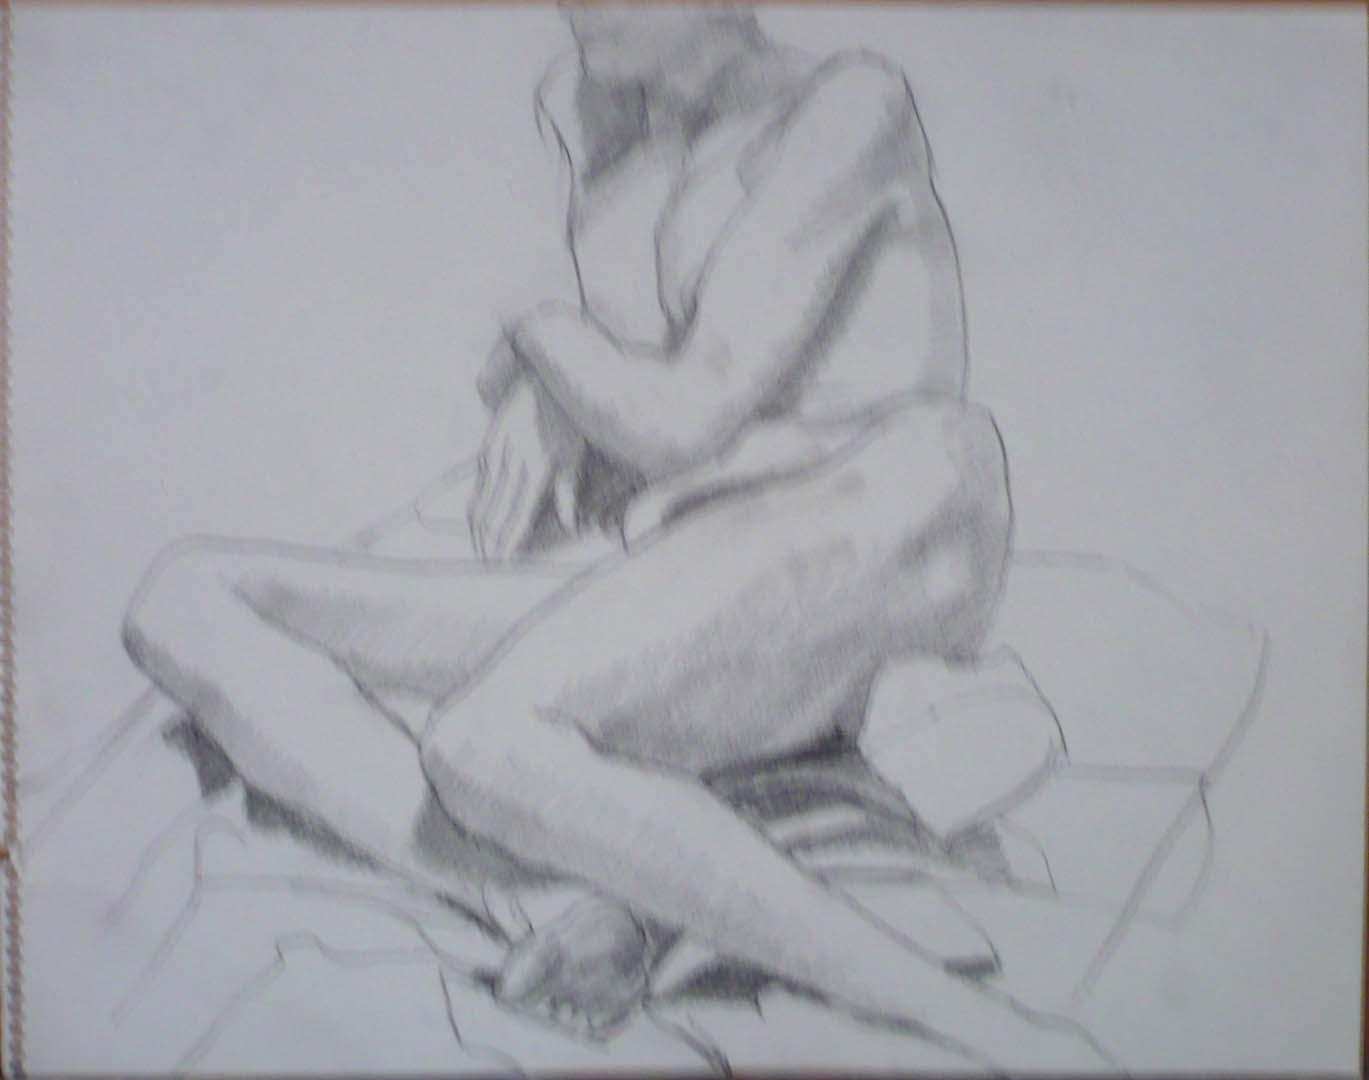 Leaning Female Nude in Studio Pencil 11 x 14